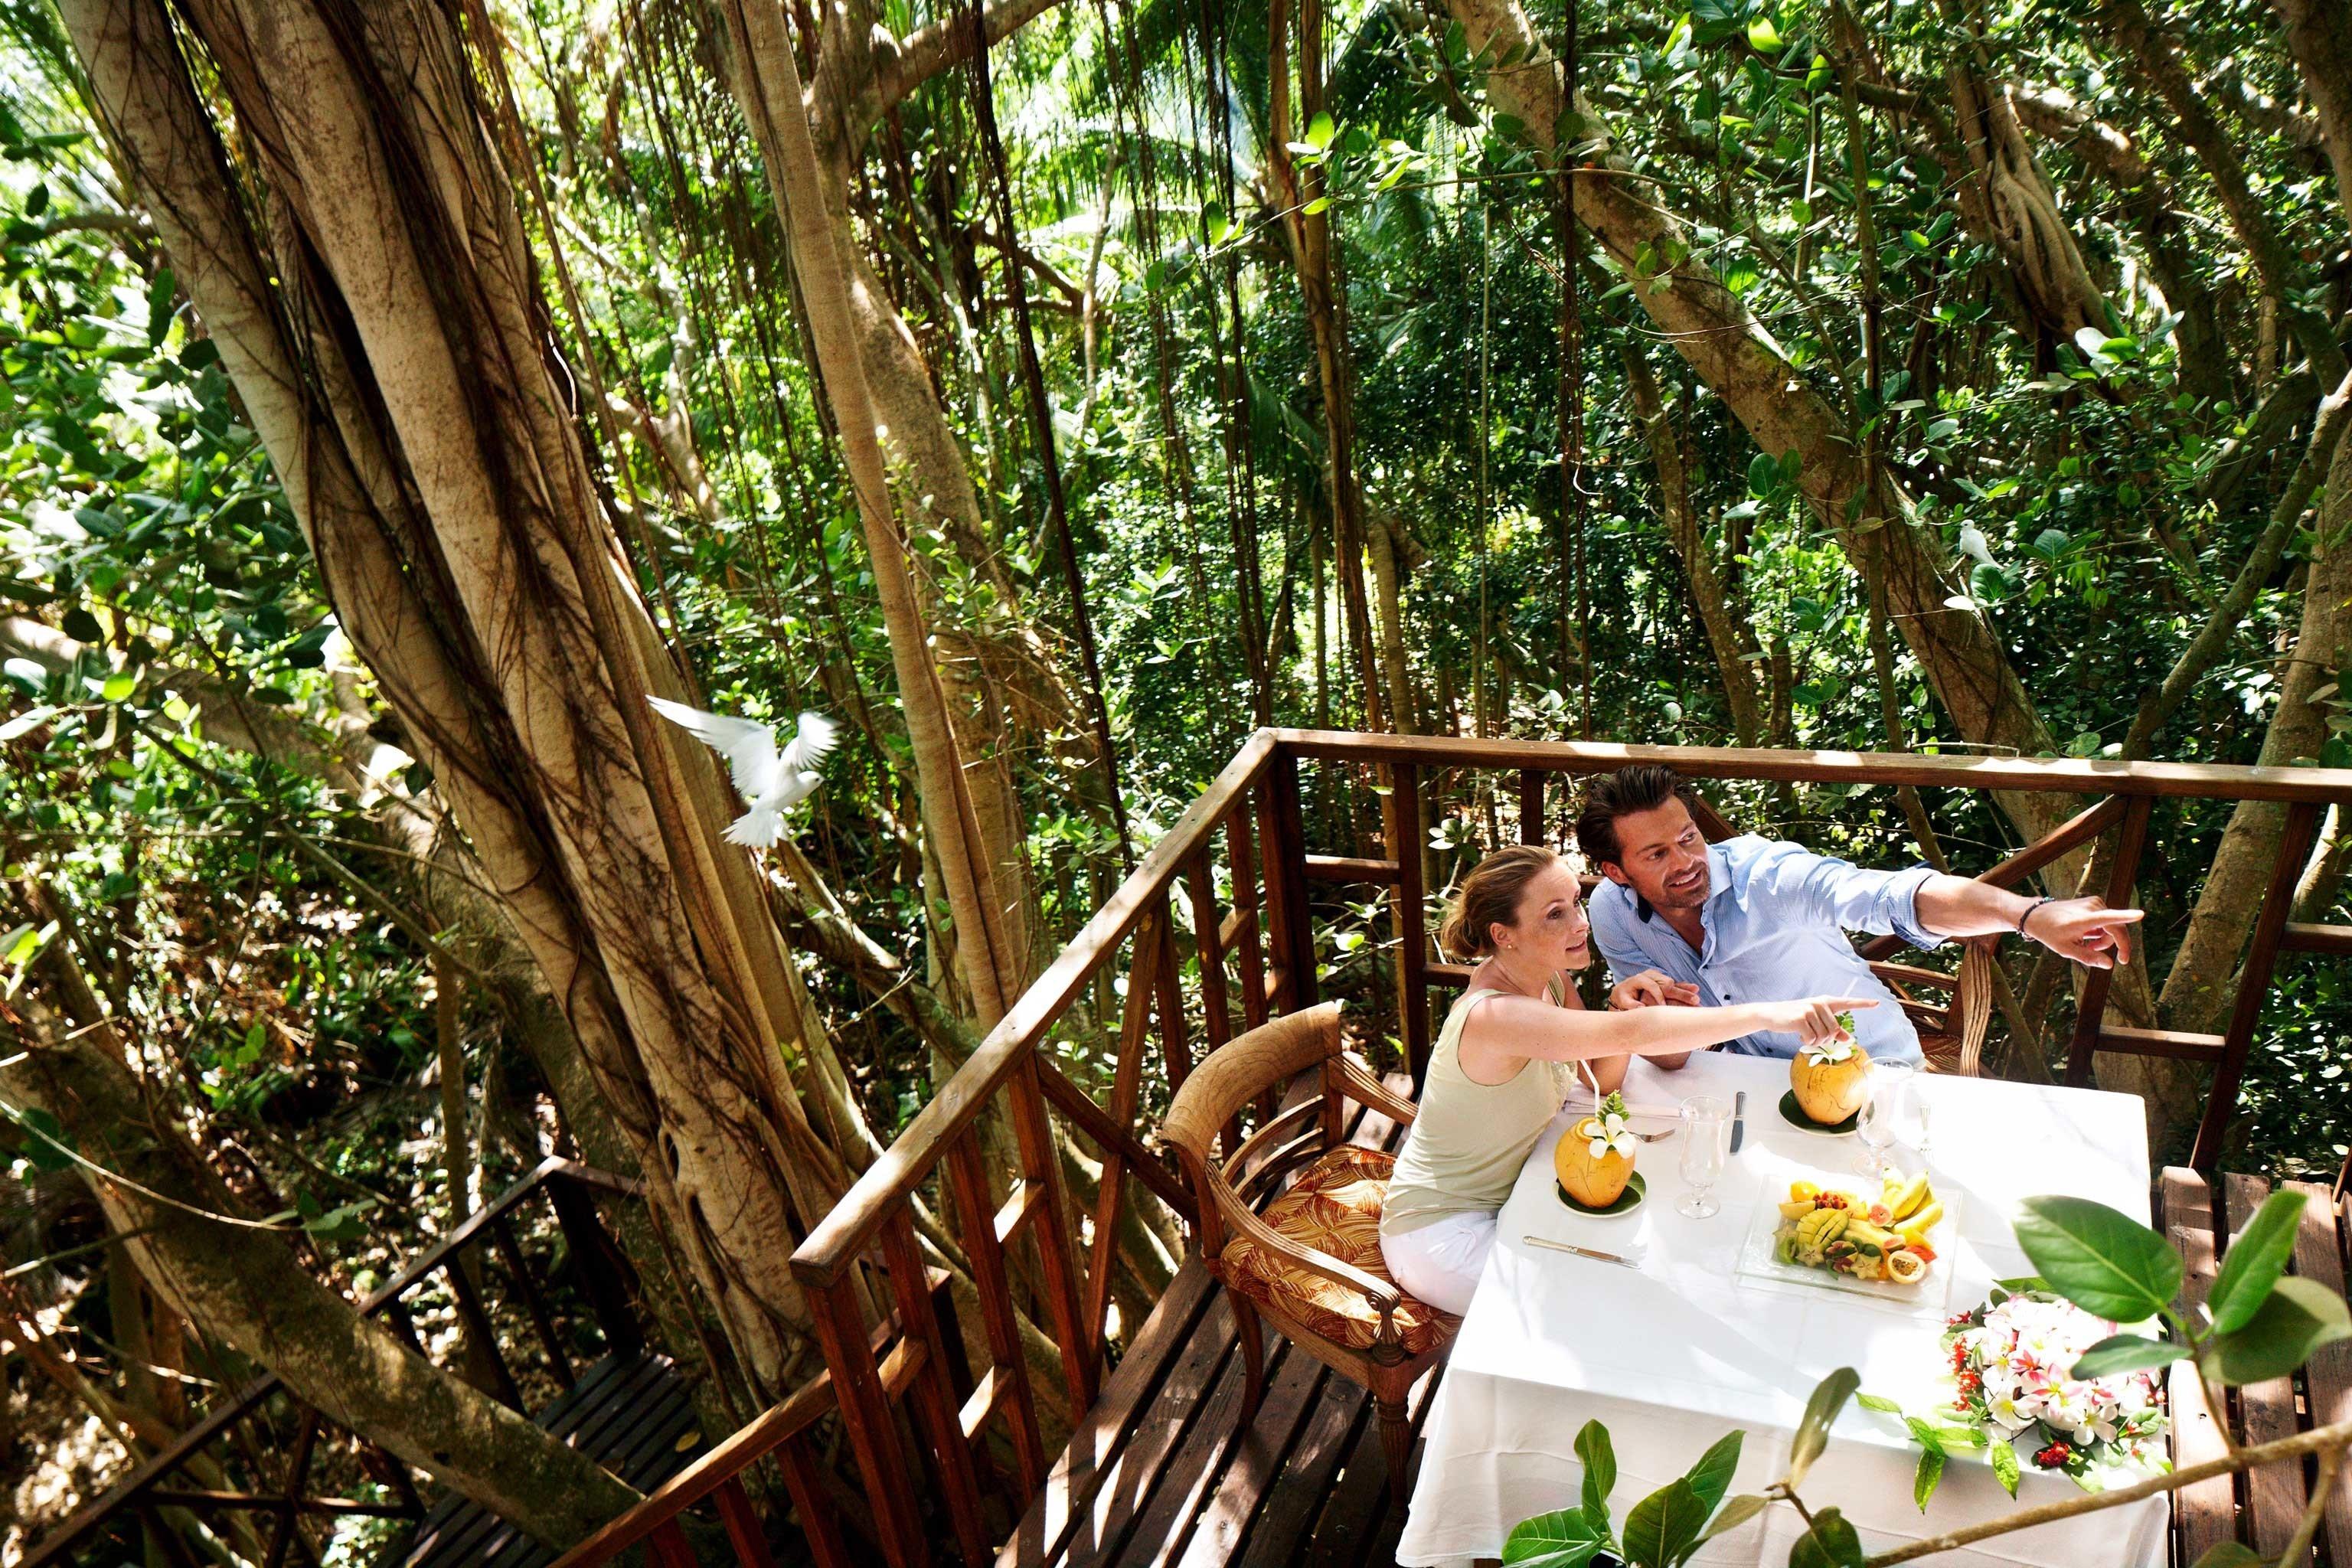 Dining Drink Eat Honeymoon Island Jungle Outdoors Romance Romantic tree habitat rainforest Forest plant woodland flower backyard